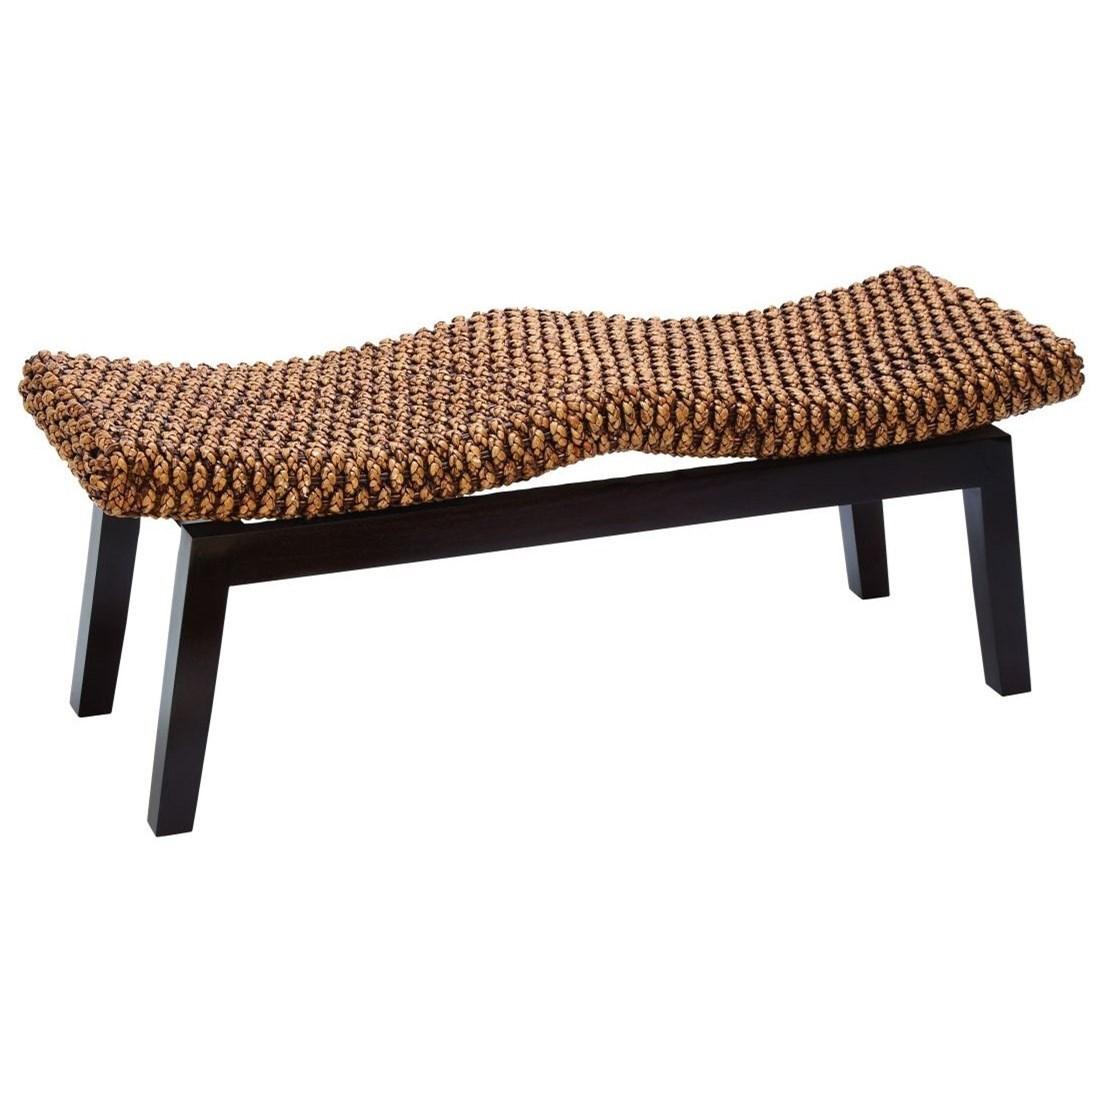 Wood/Hyacinth Bench